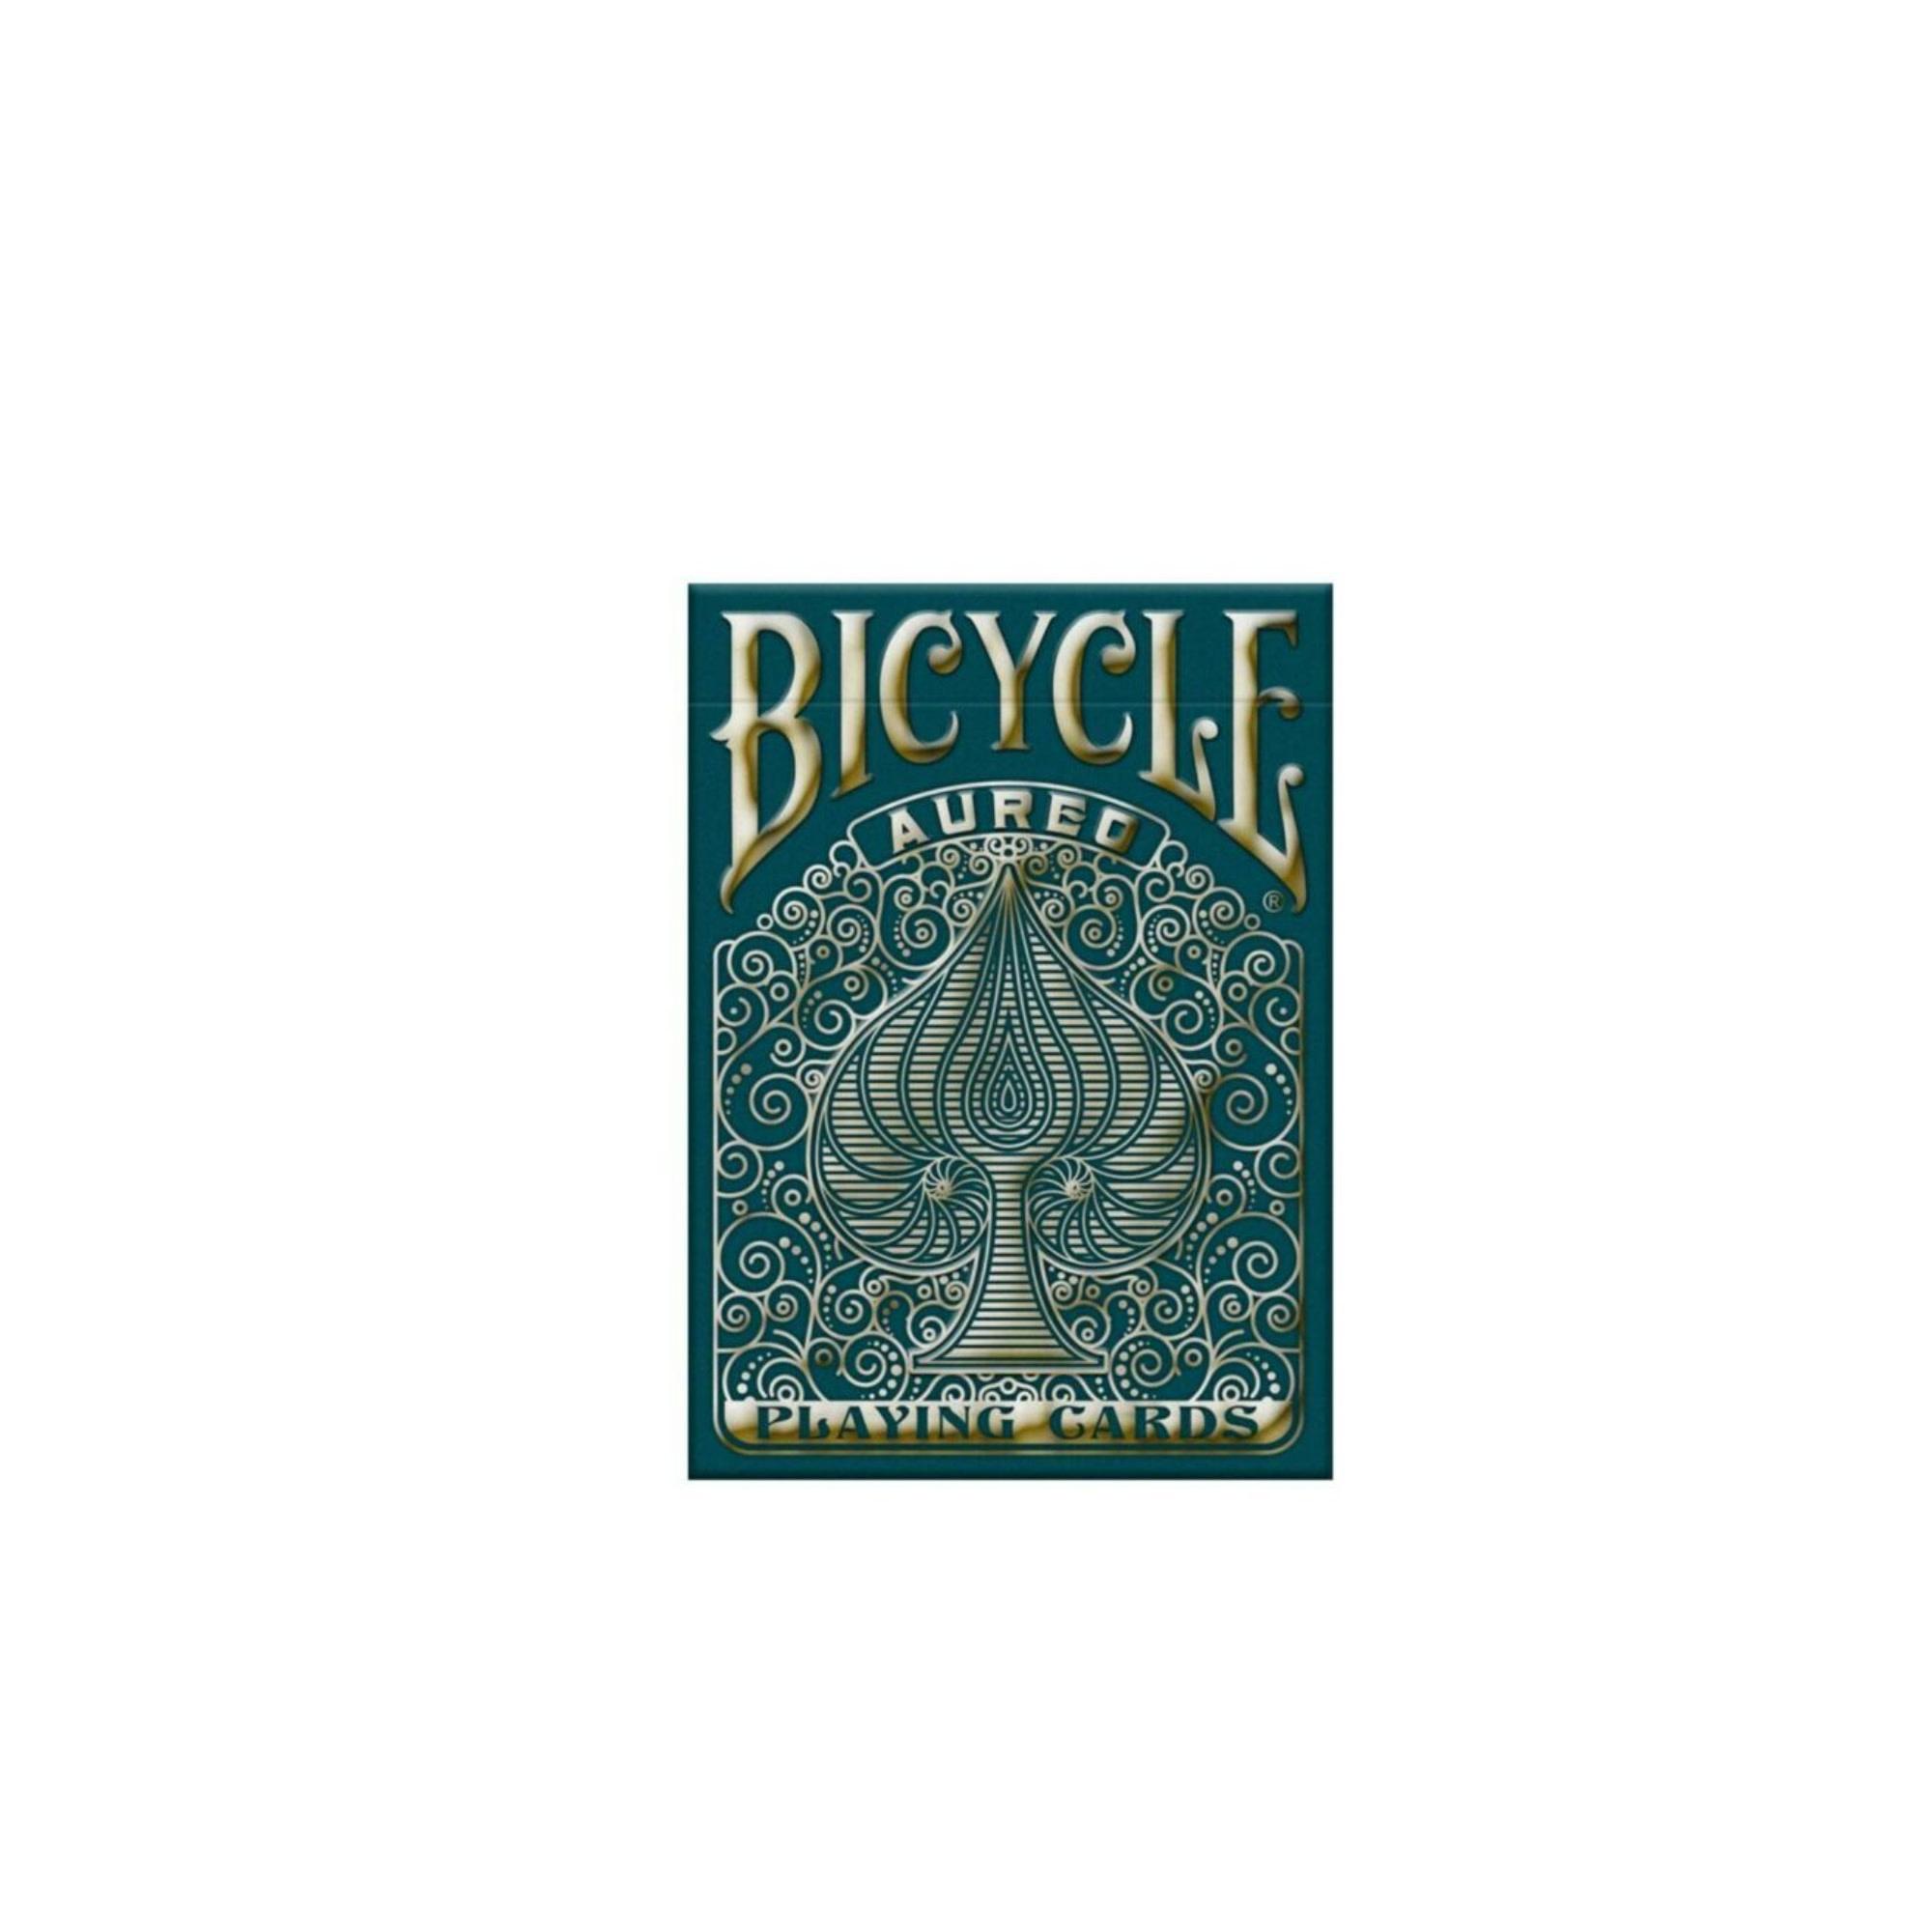 Bicycle Cartes à jouer Bicycle - Aureo Cards